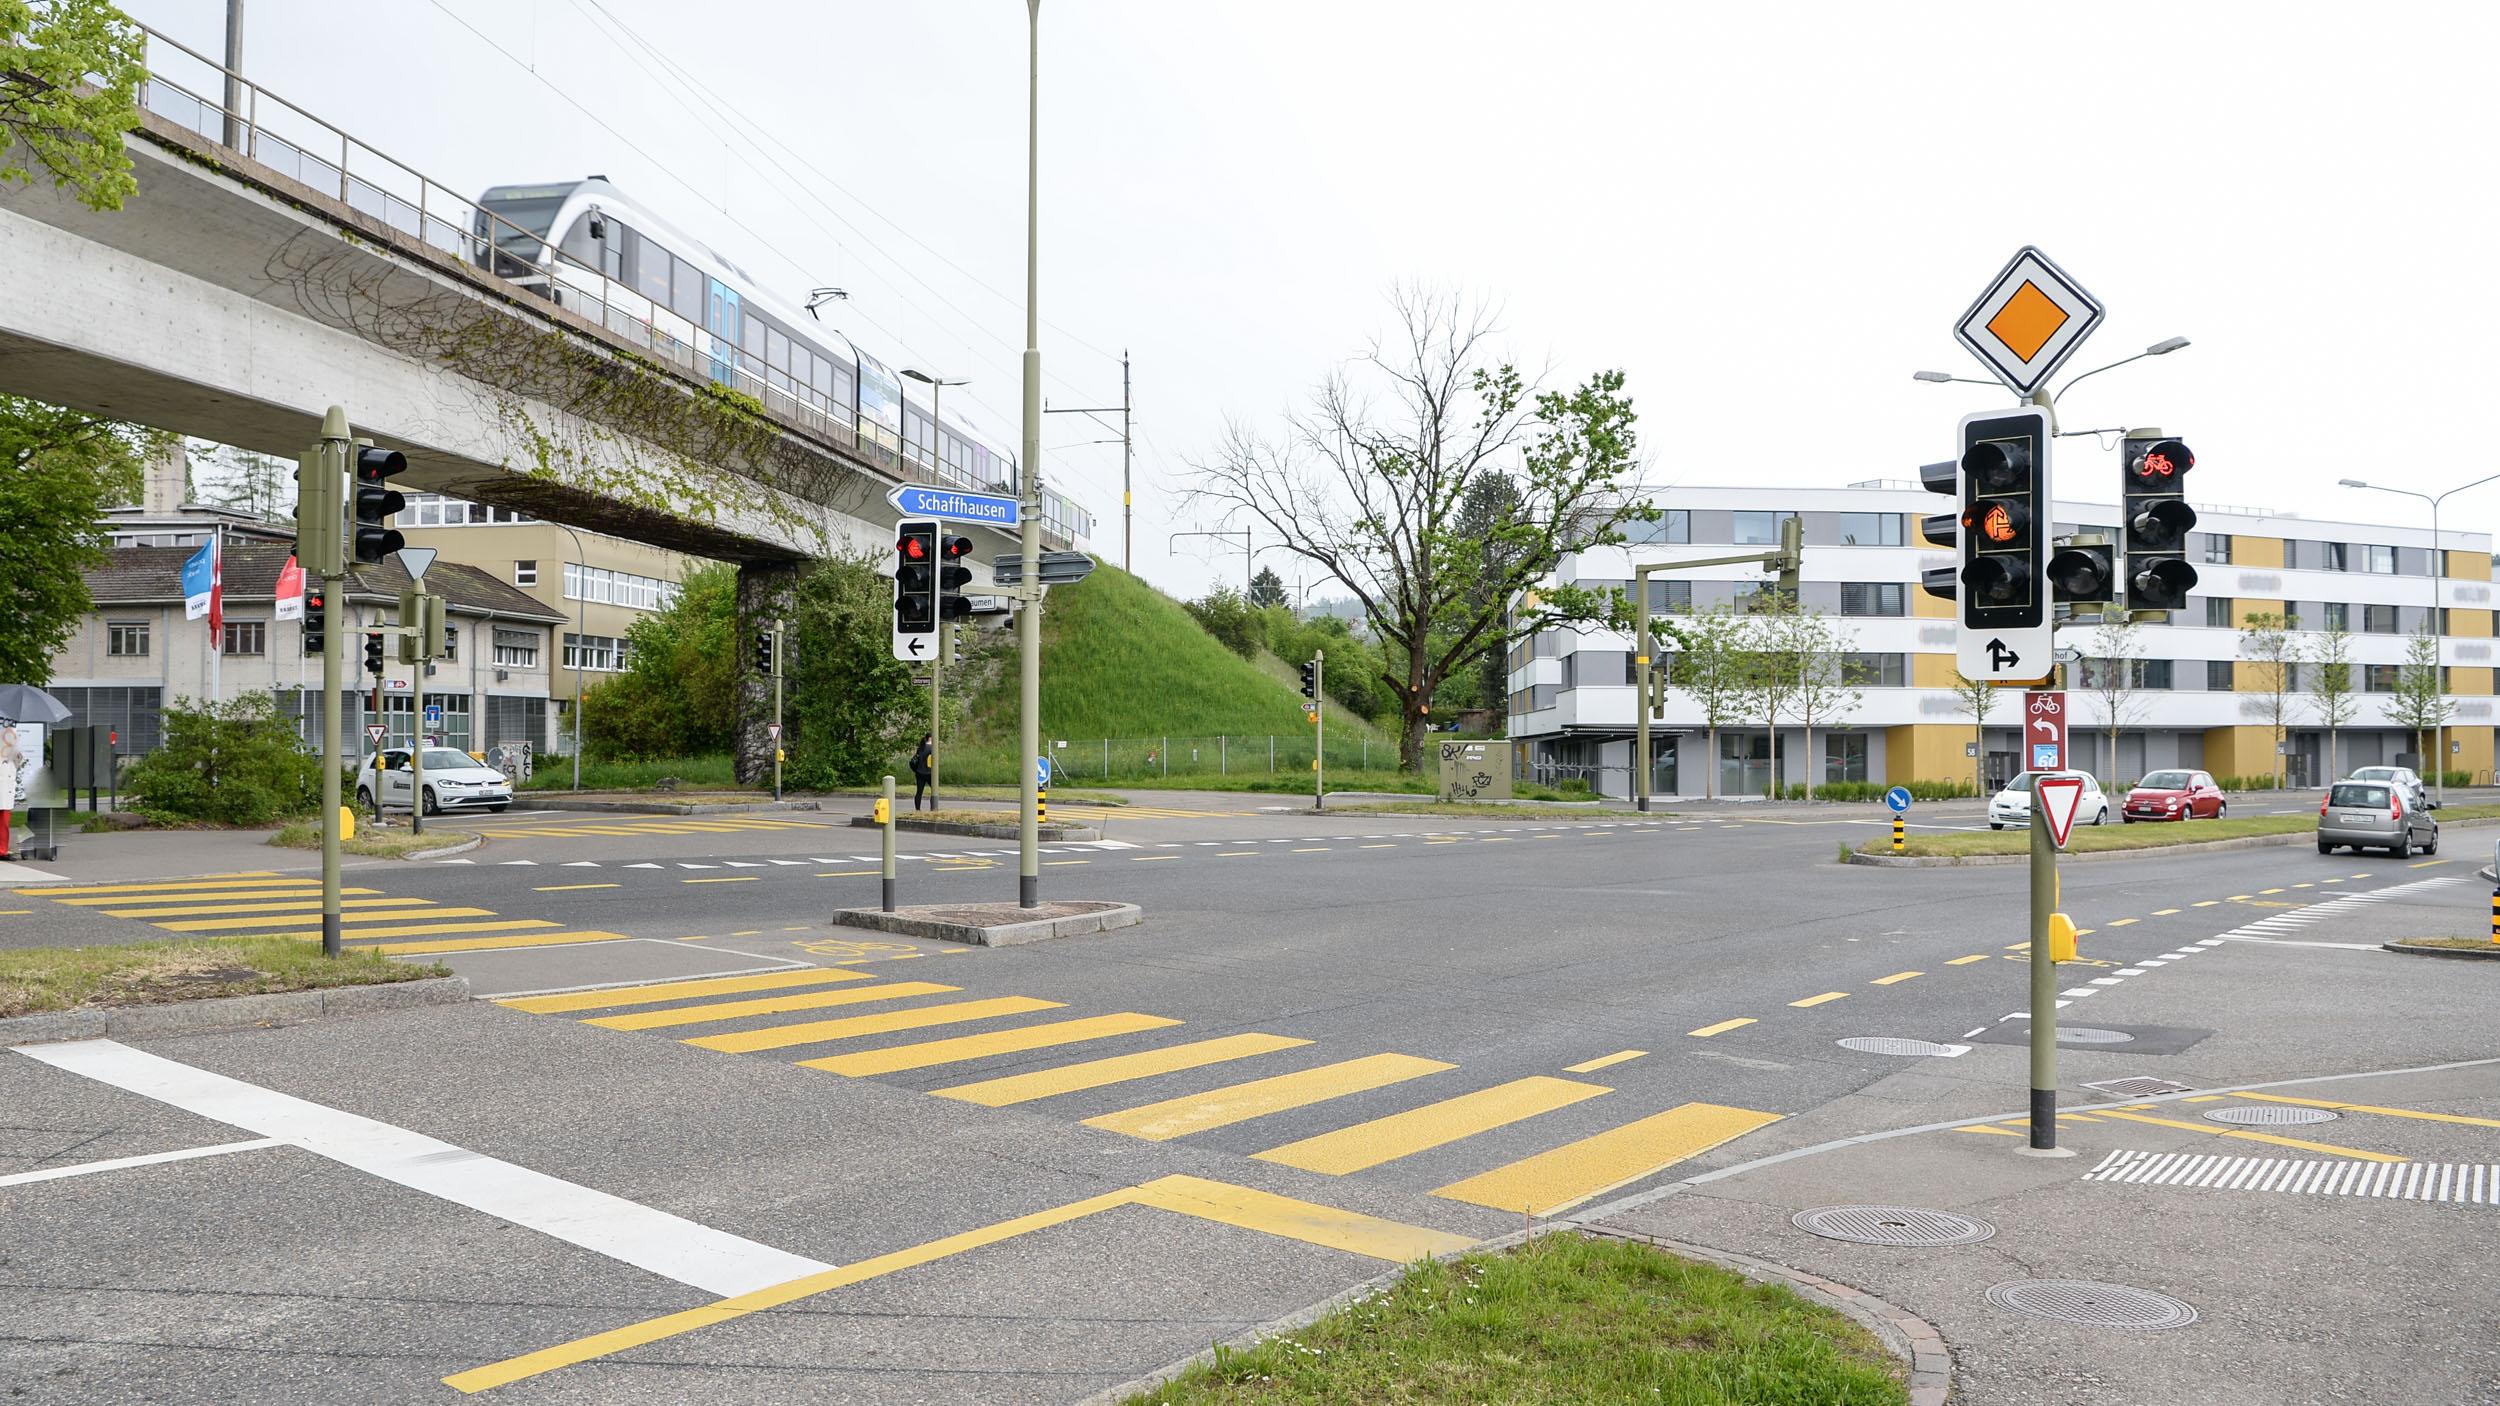 Kreuzung via Bahnhof